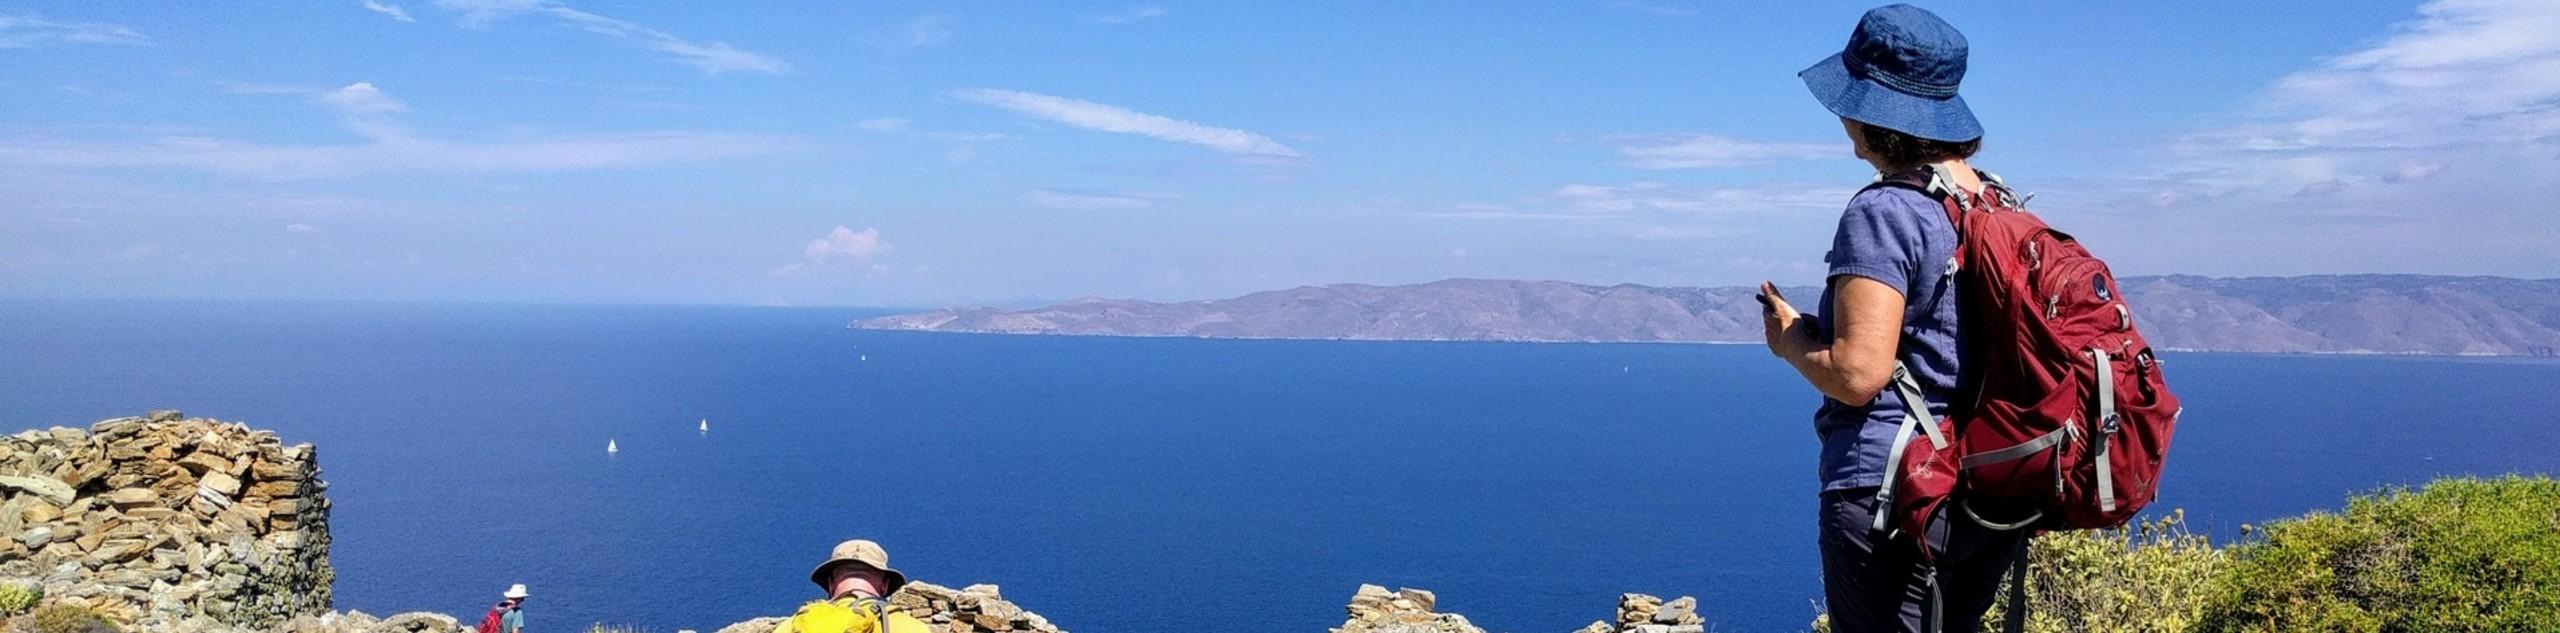 Cyclades Islands Sailing Adventure